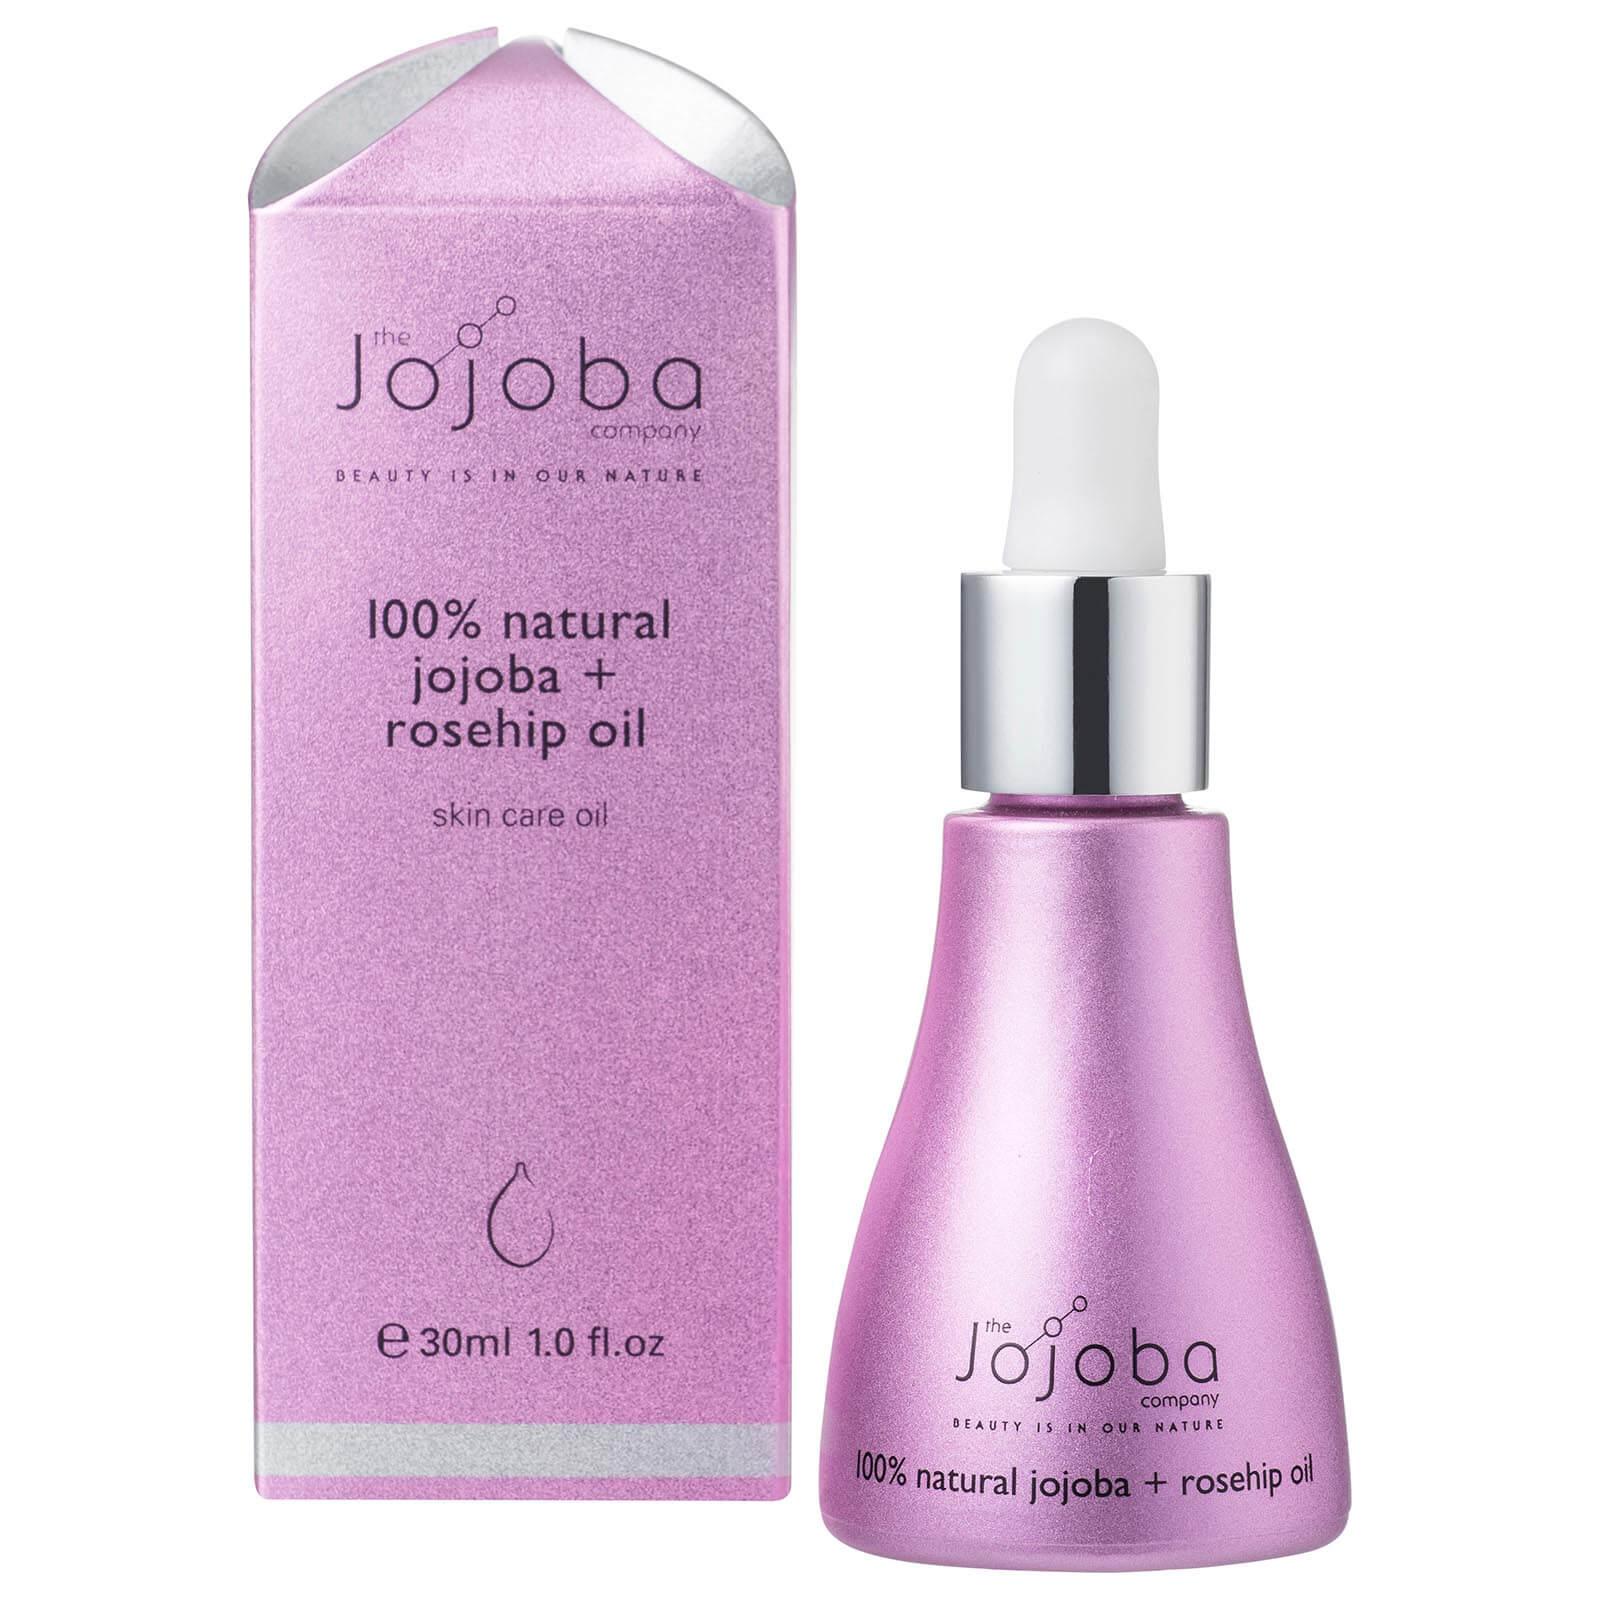 The Jojoba Company Huile de Jojoba et d'Églantier 100% naturelle The Jojoba Company 30ml